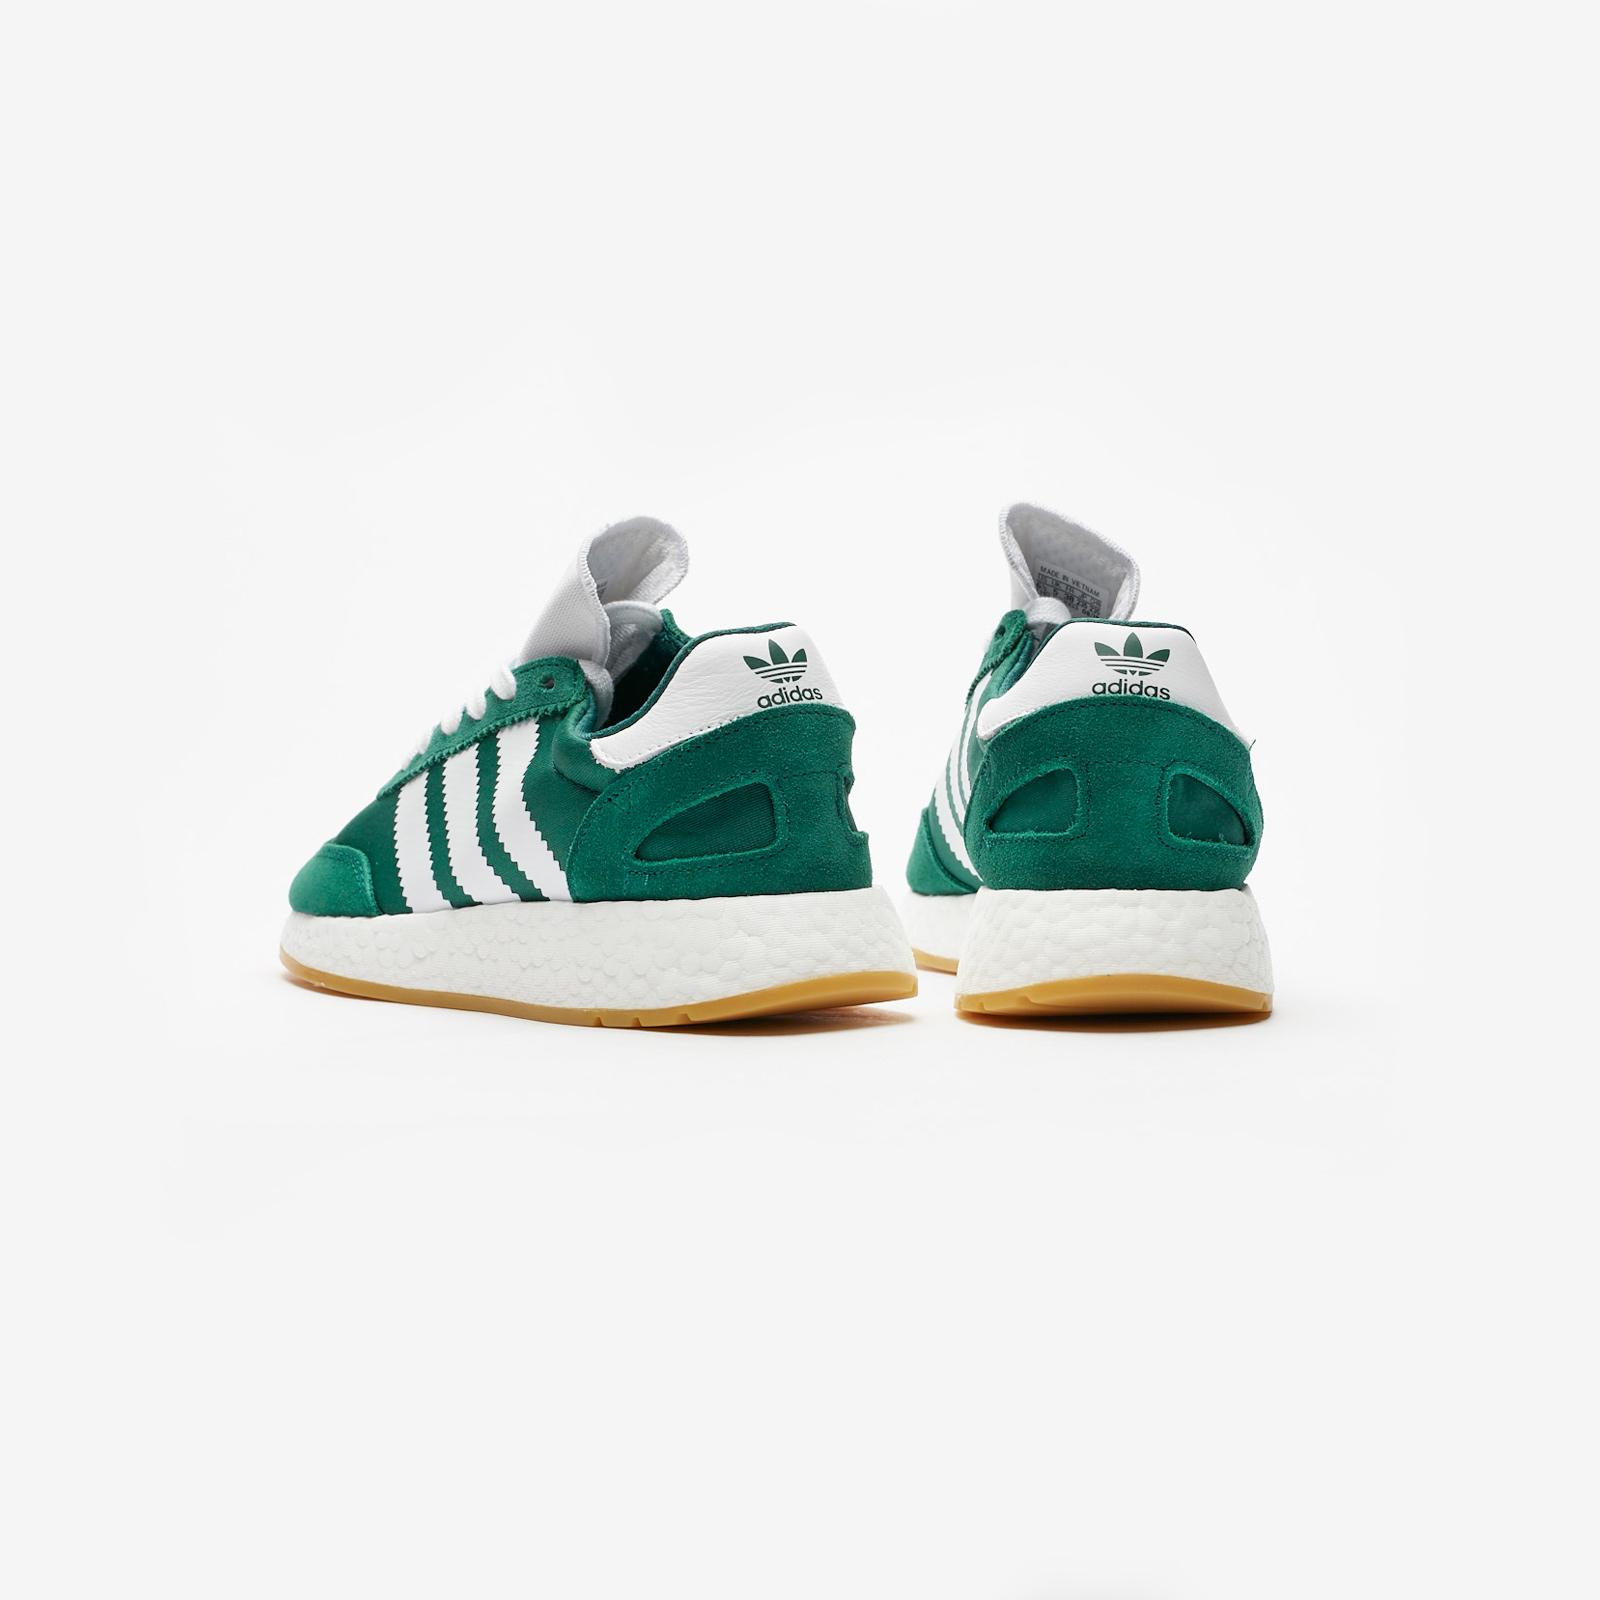 adidas I 5923 W Cg6022 Sneakersnstuff I Sneakers